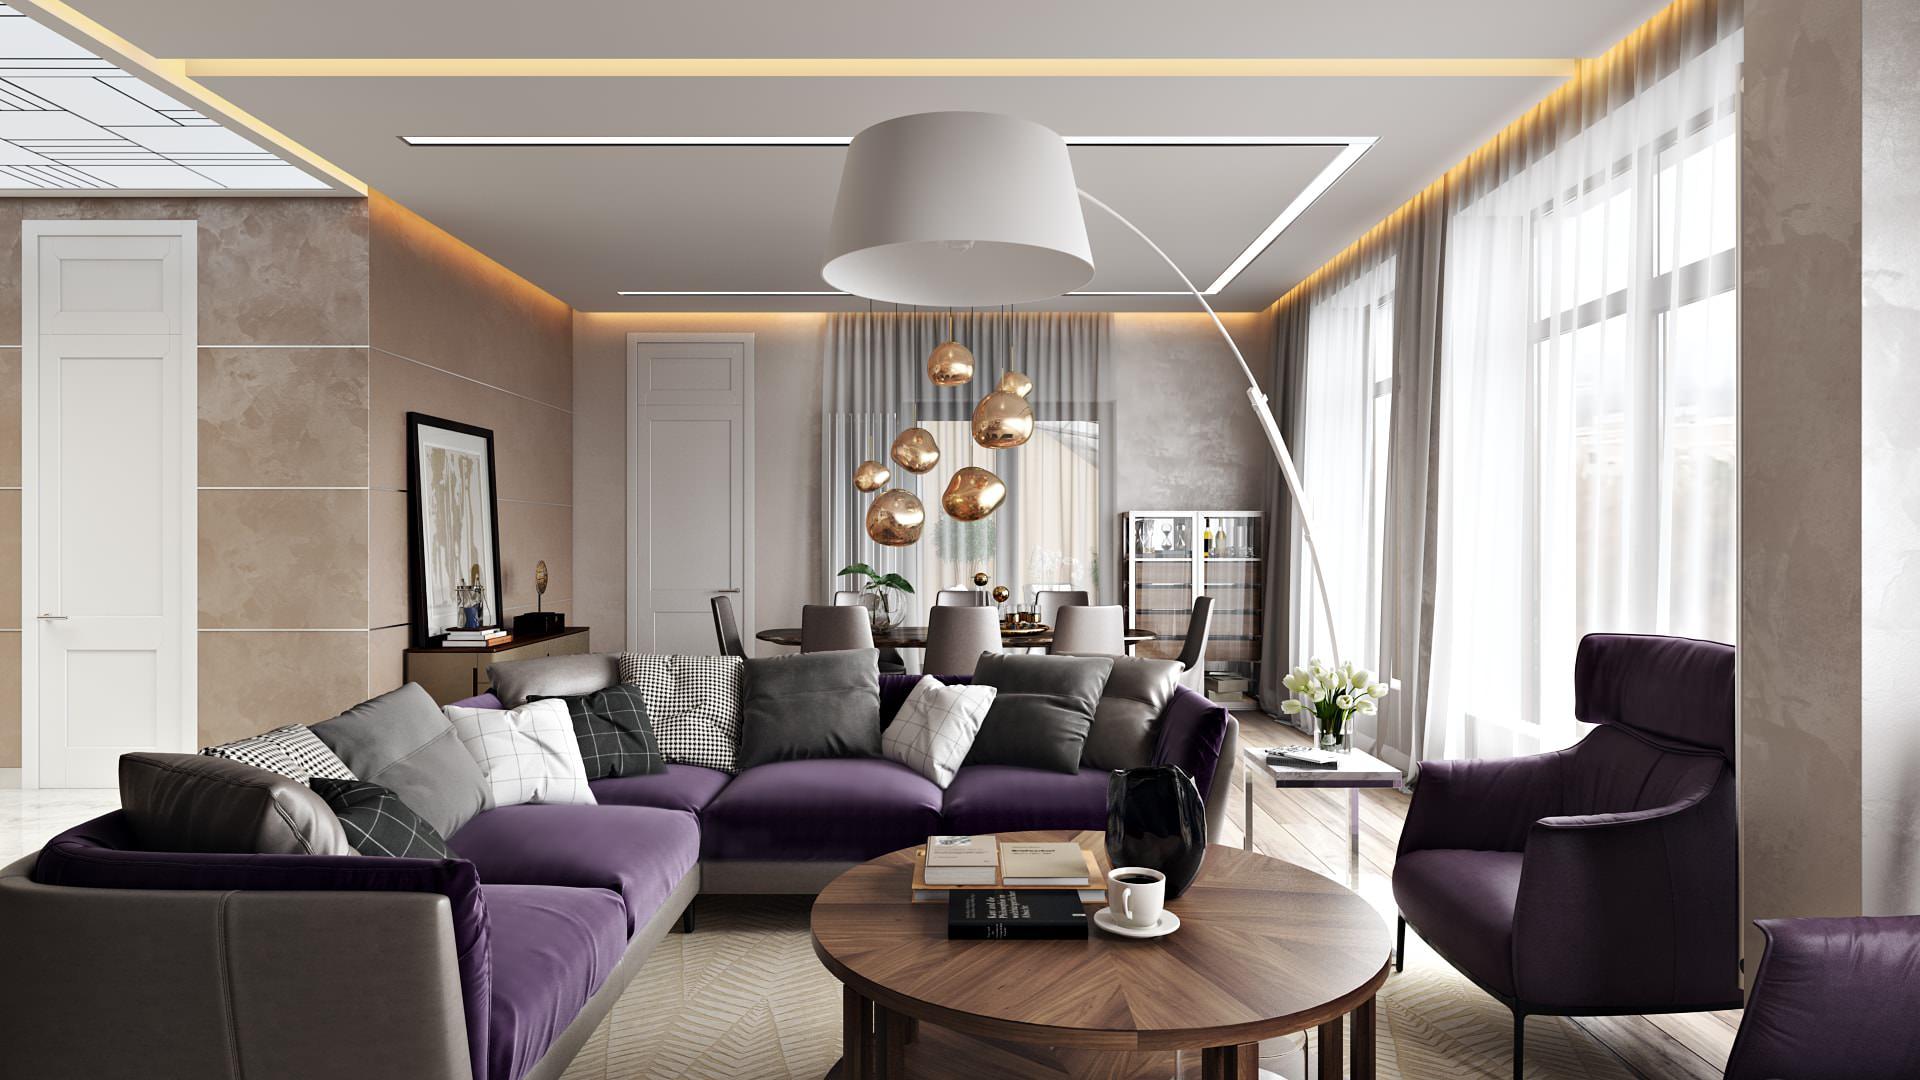 Apartment Interior Rendering For A Comfortable Design Archicgi Com